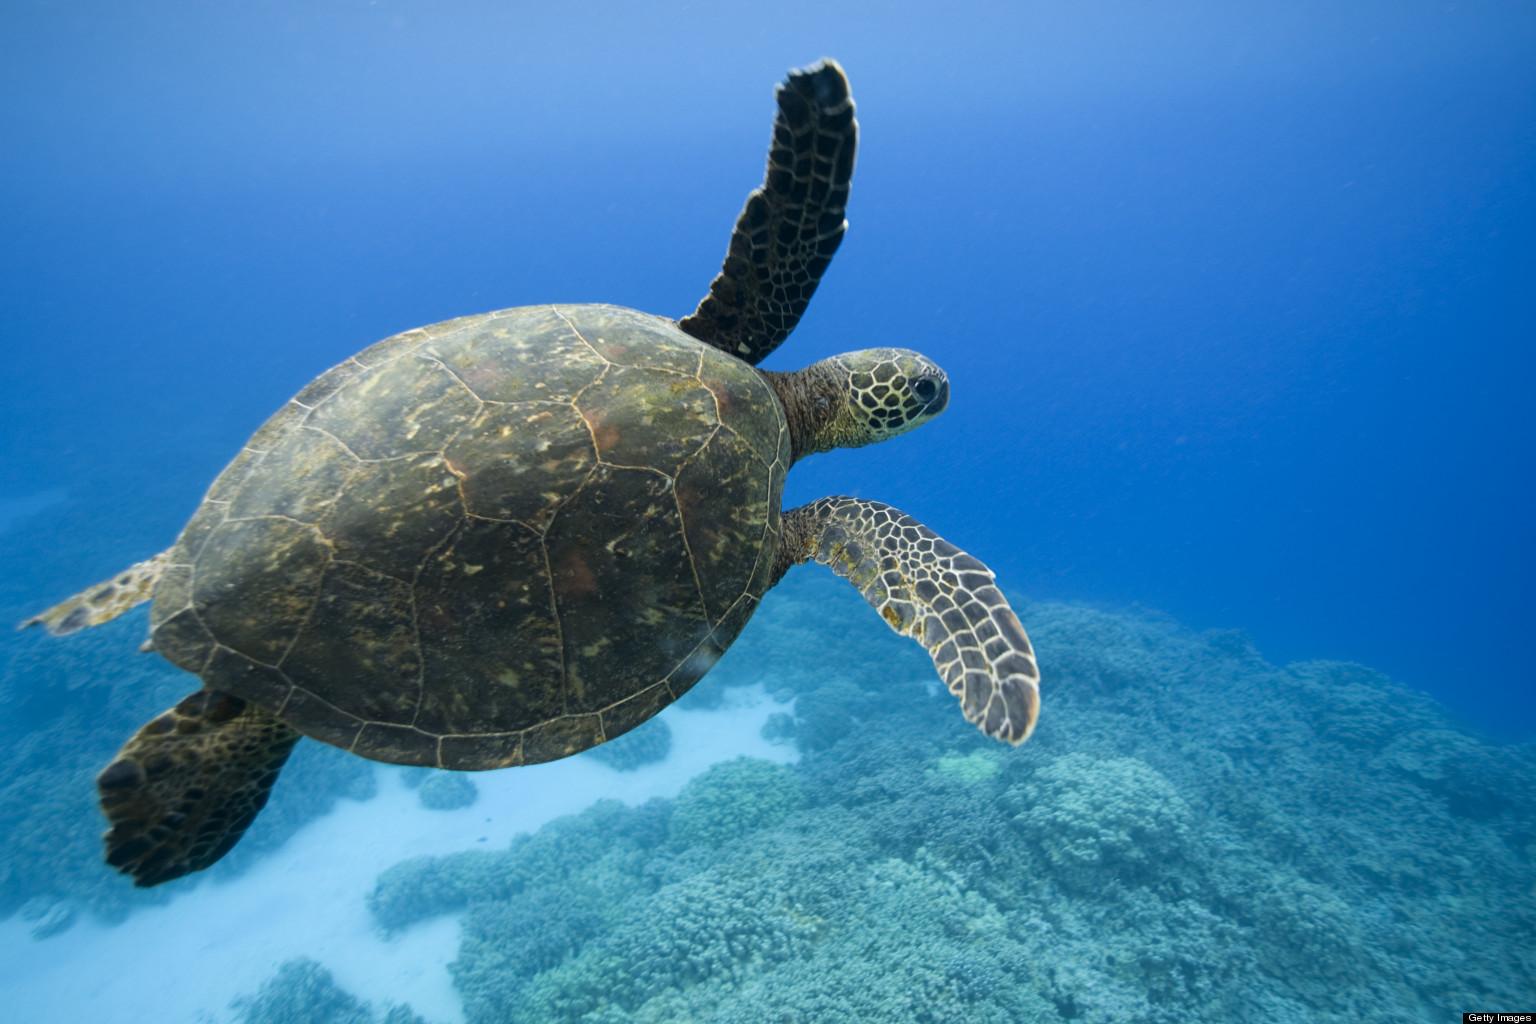 O G Turtle Documentary Sea Turtle Documentary...